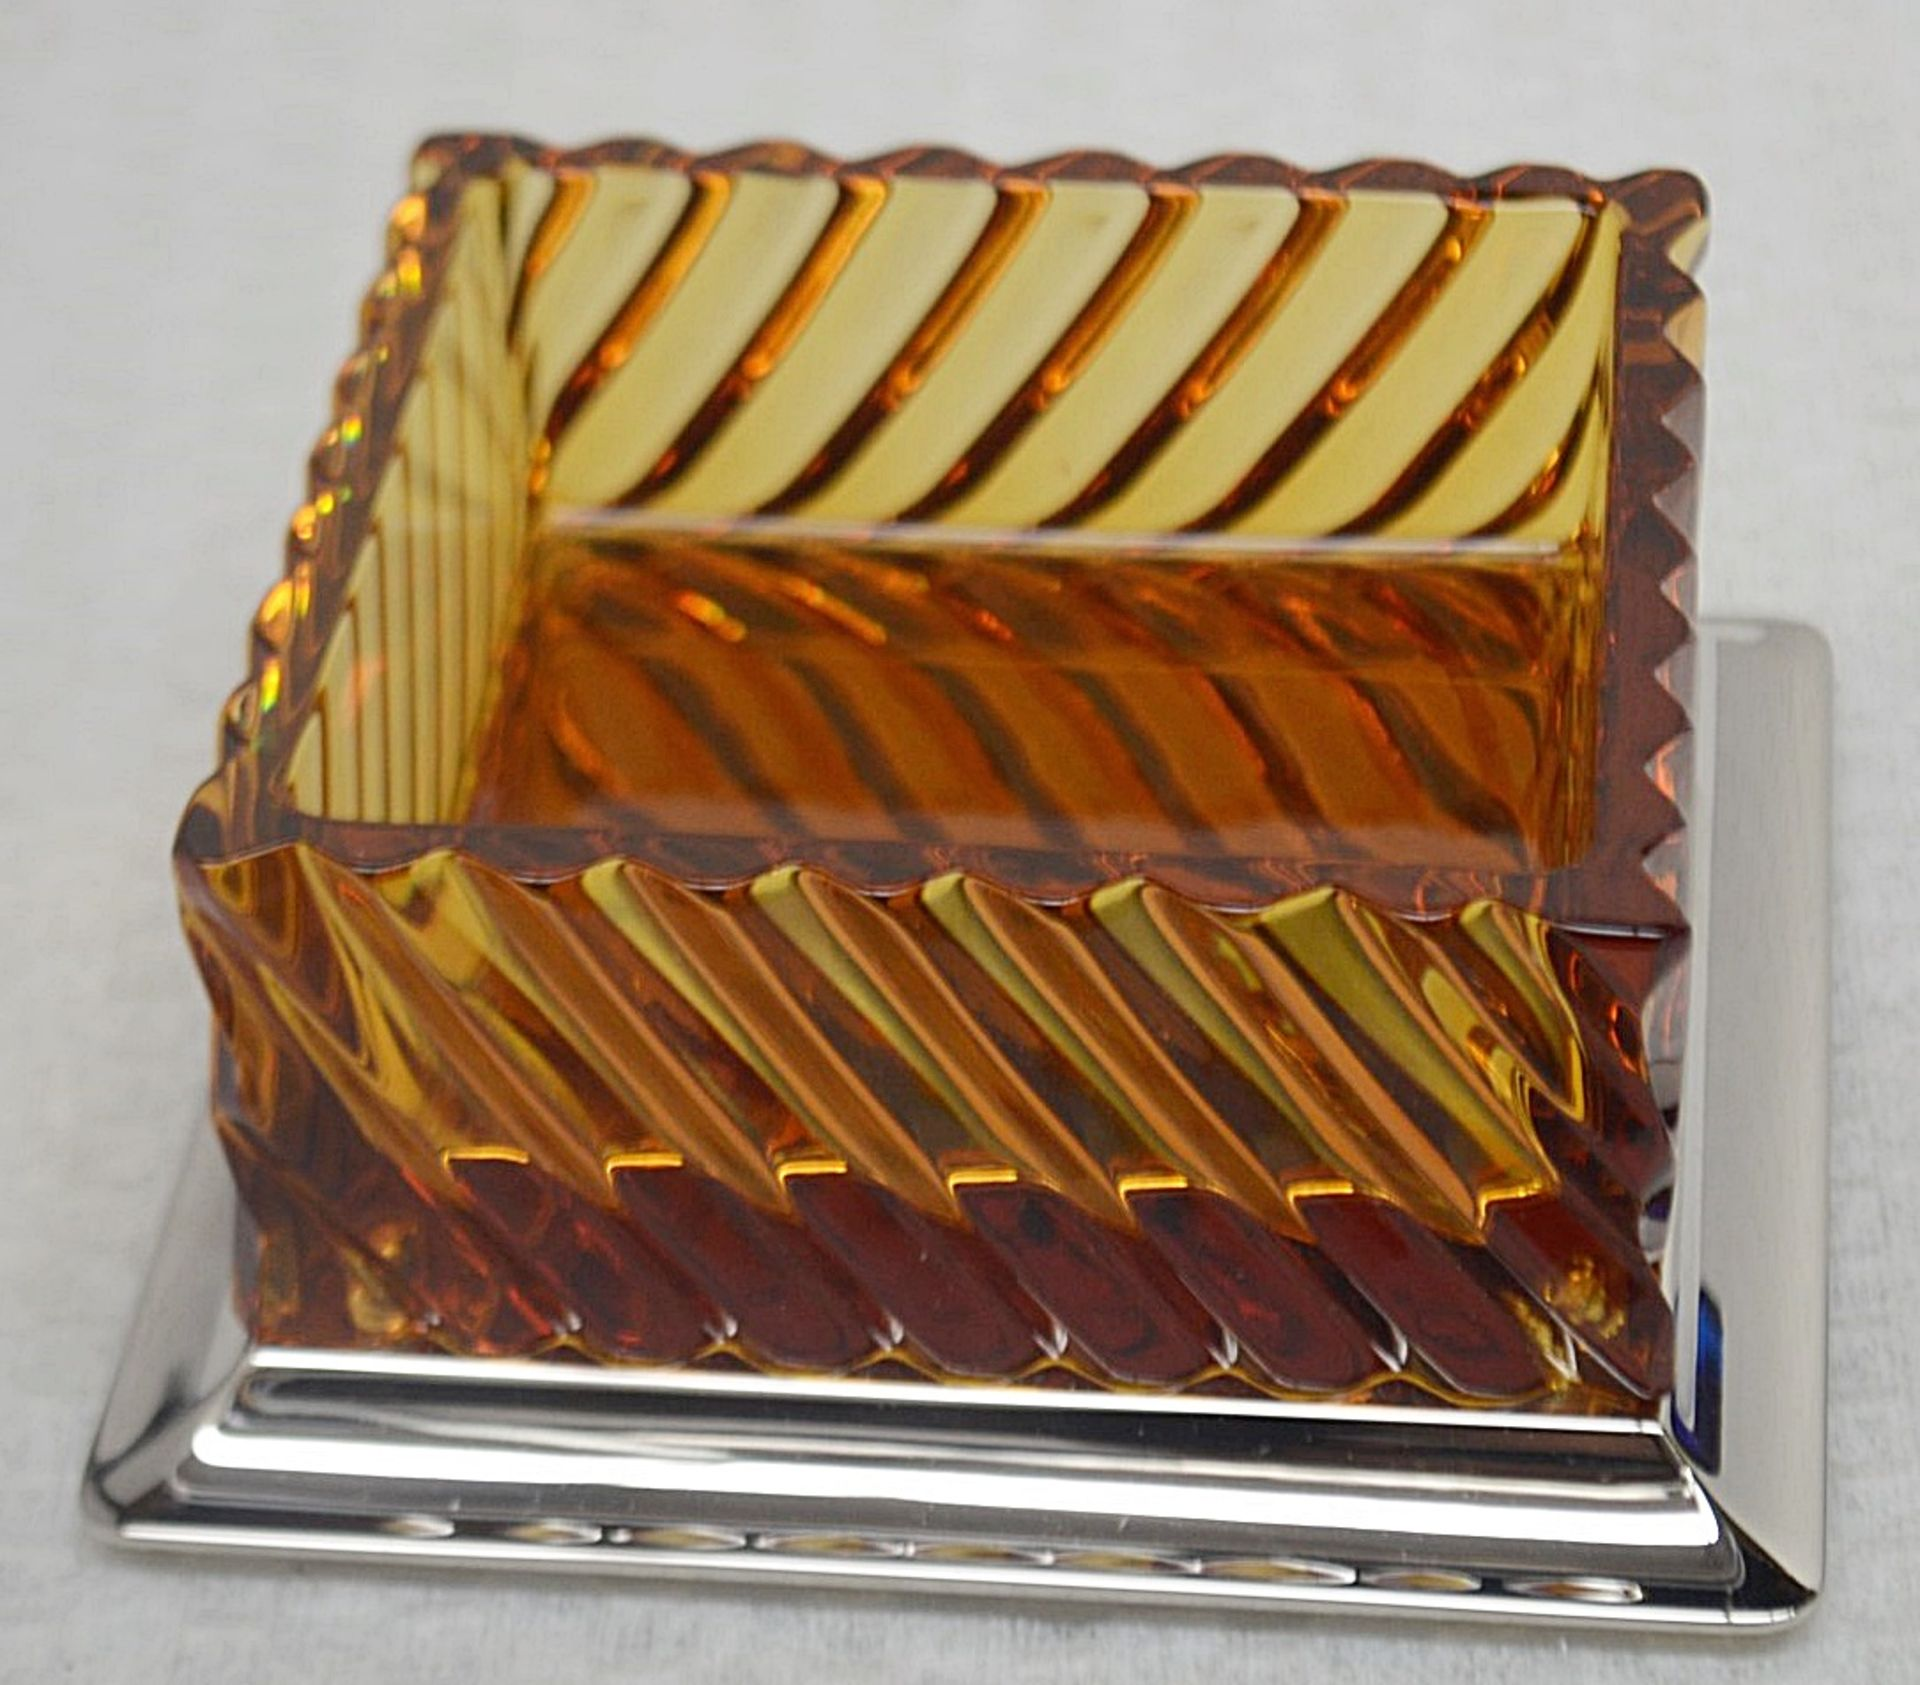 1 x BALDI 'Home Jewels' Italian Hand-crafted Artisan Crystal Box In Dark Blue / Yellow - RRP £1,015 - Image 2 of 4